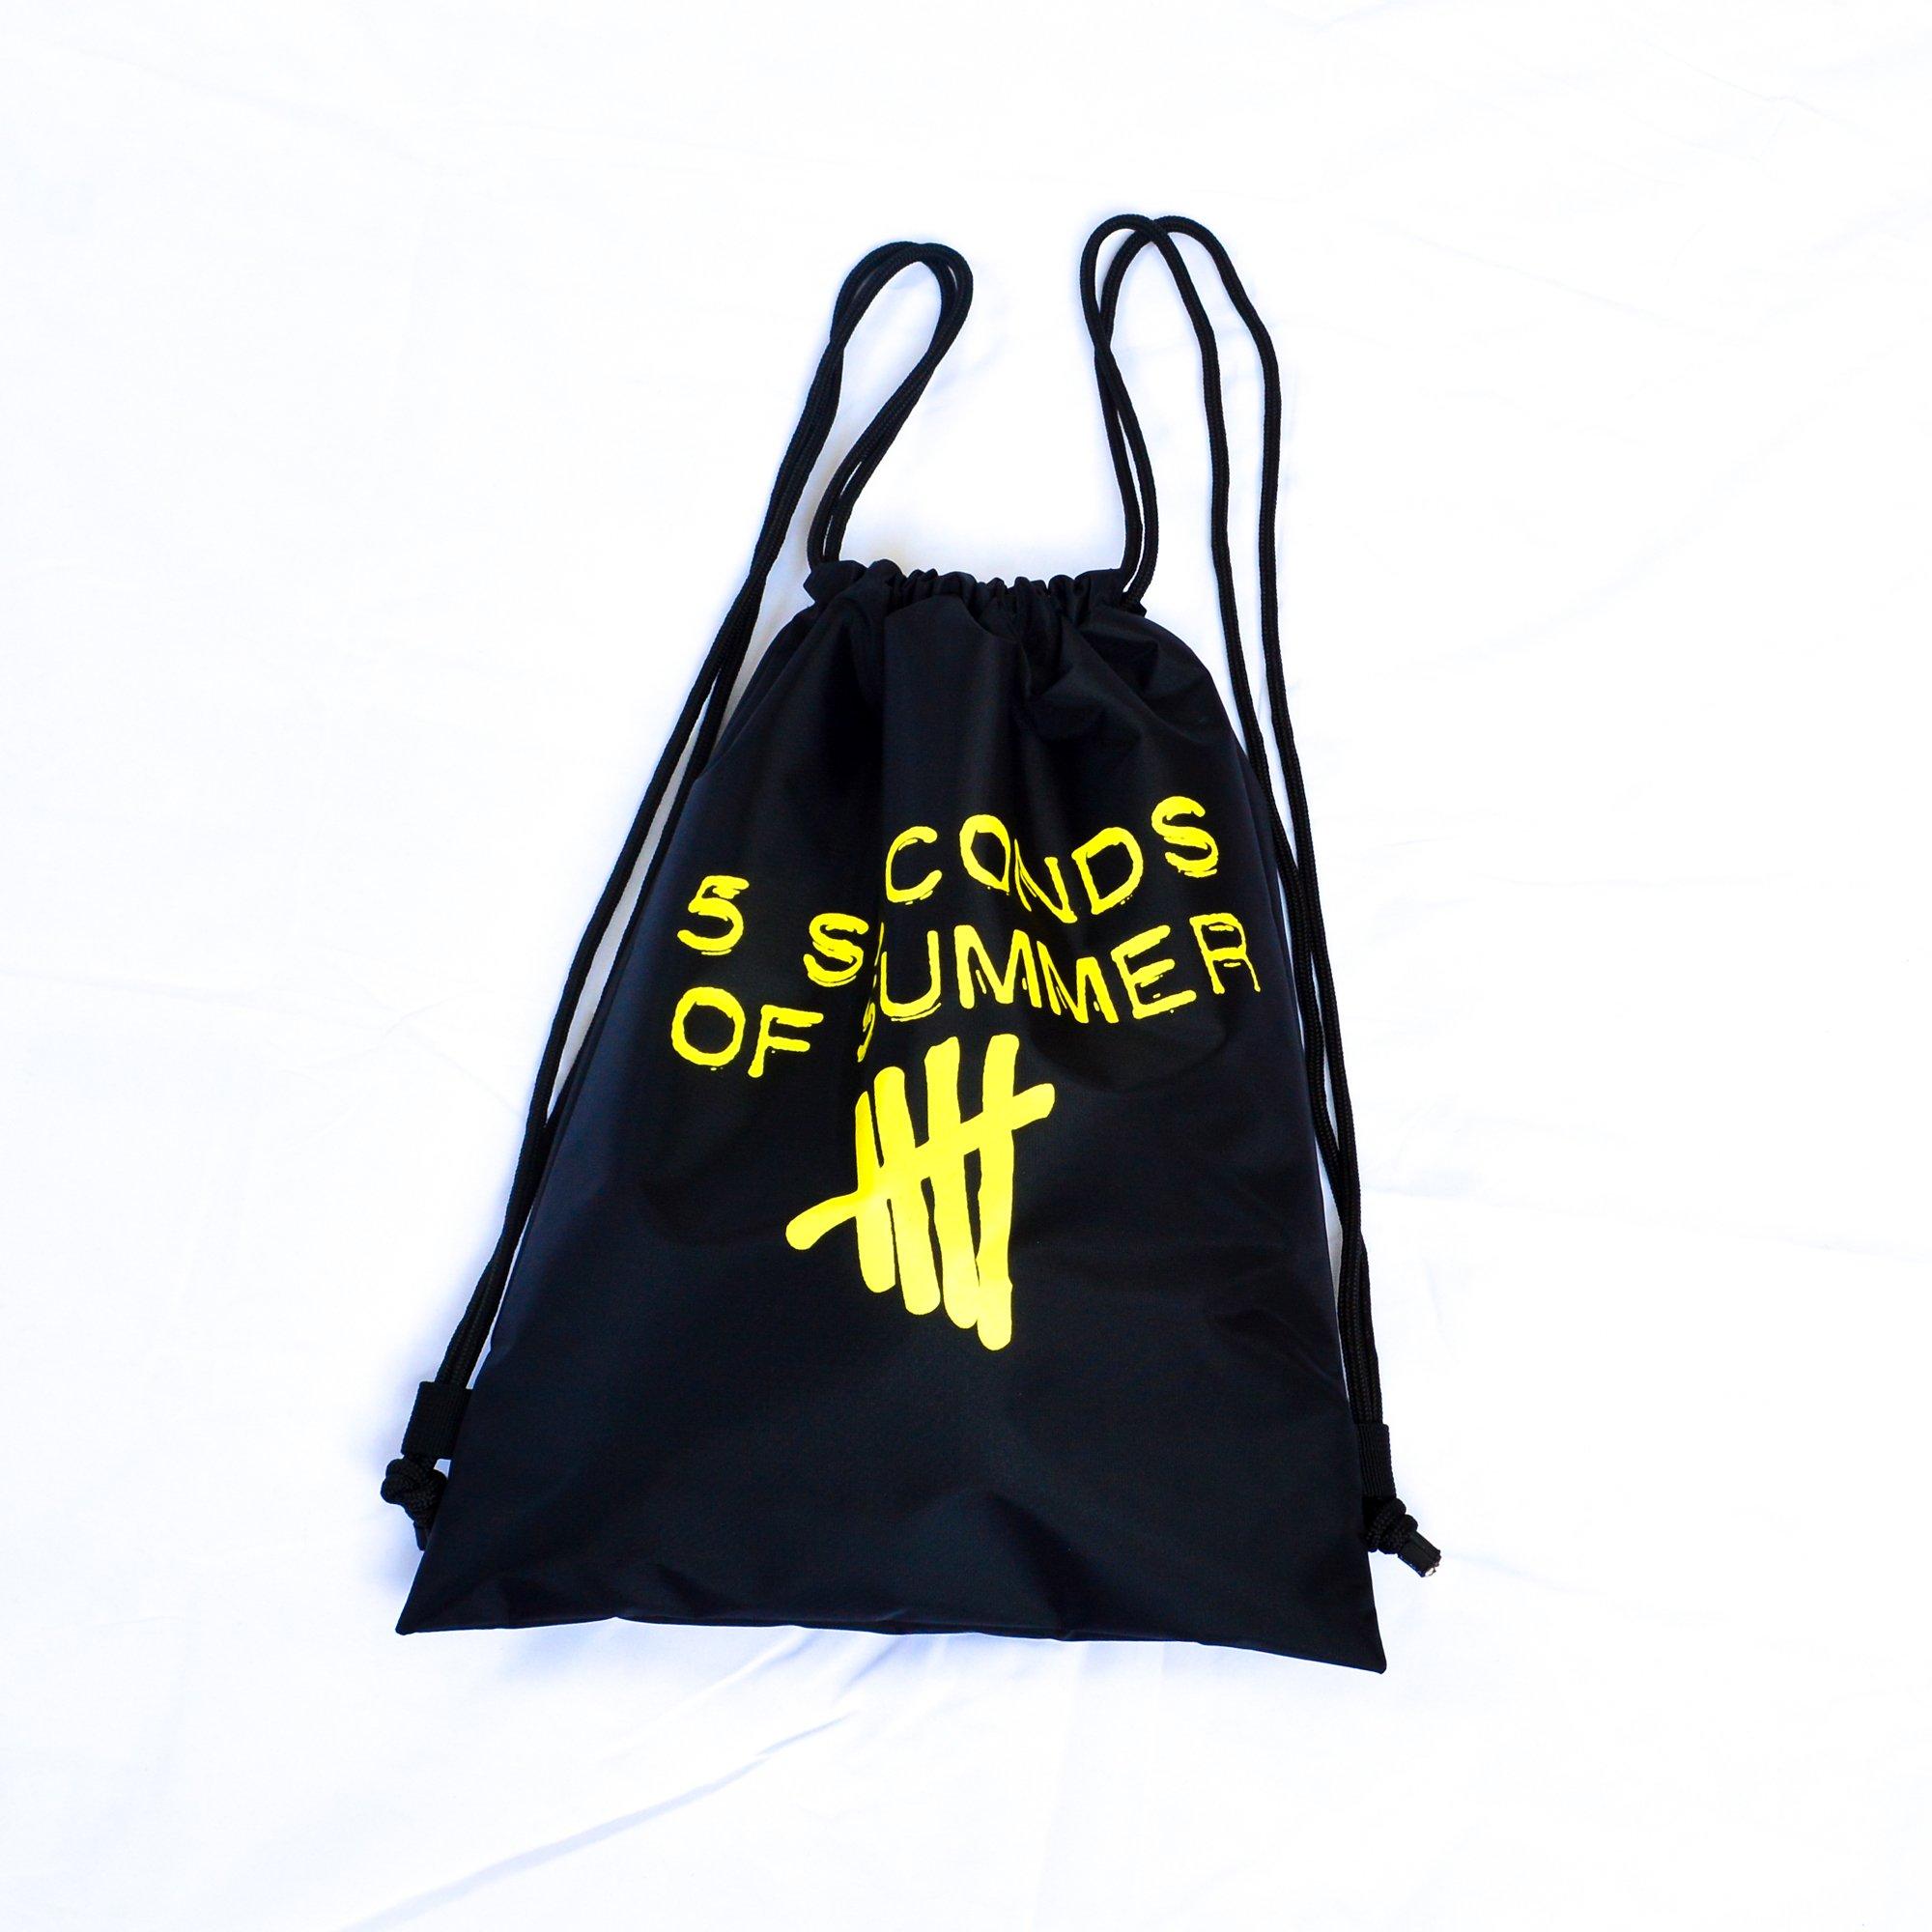 DrawString Bag 5 Seconds of Summer String Bags 187 by chakshop (Image #2)